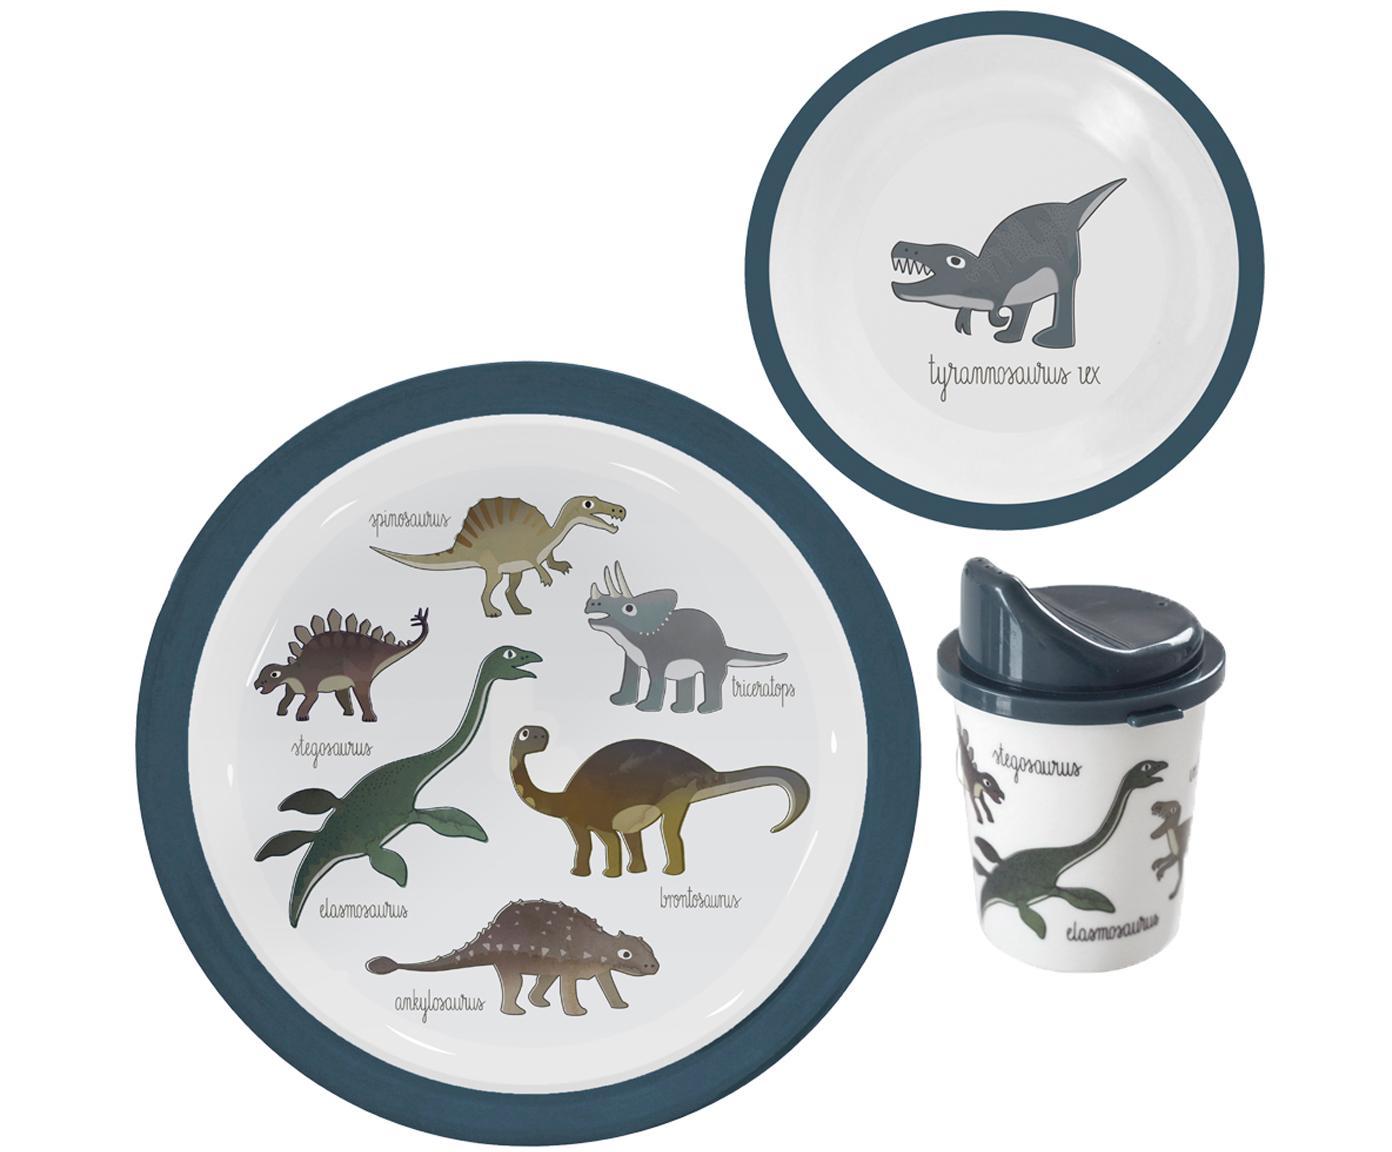 Serviesset Dino, 3-delig, Melamine, kunststof, Multicolour, Verschillende formaten